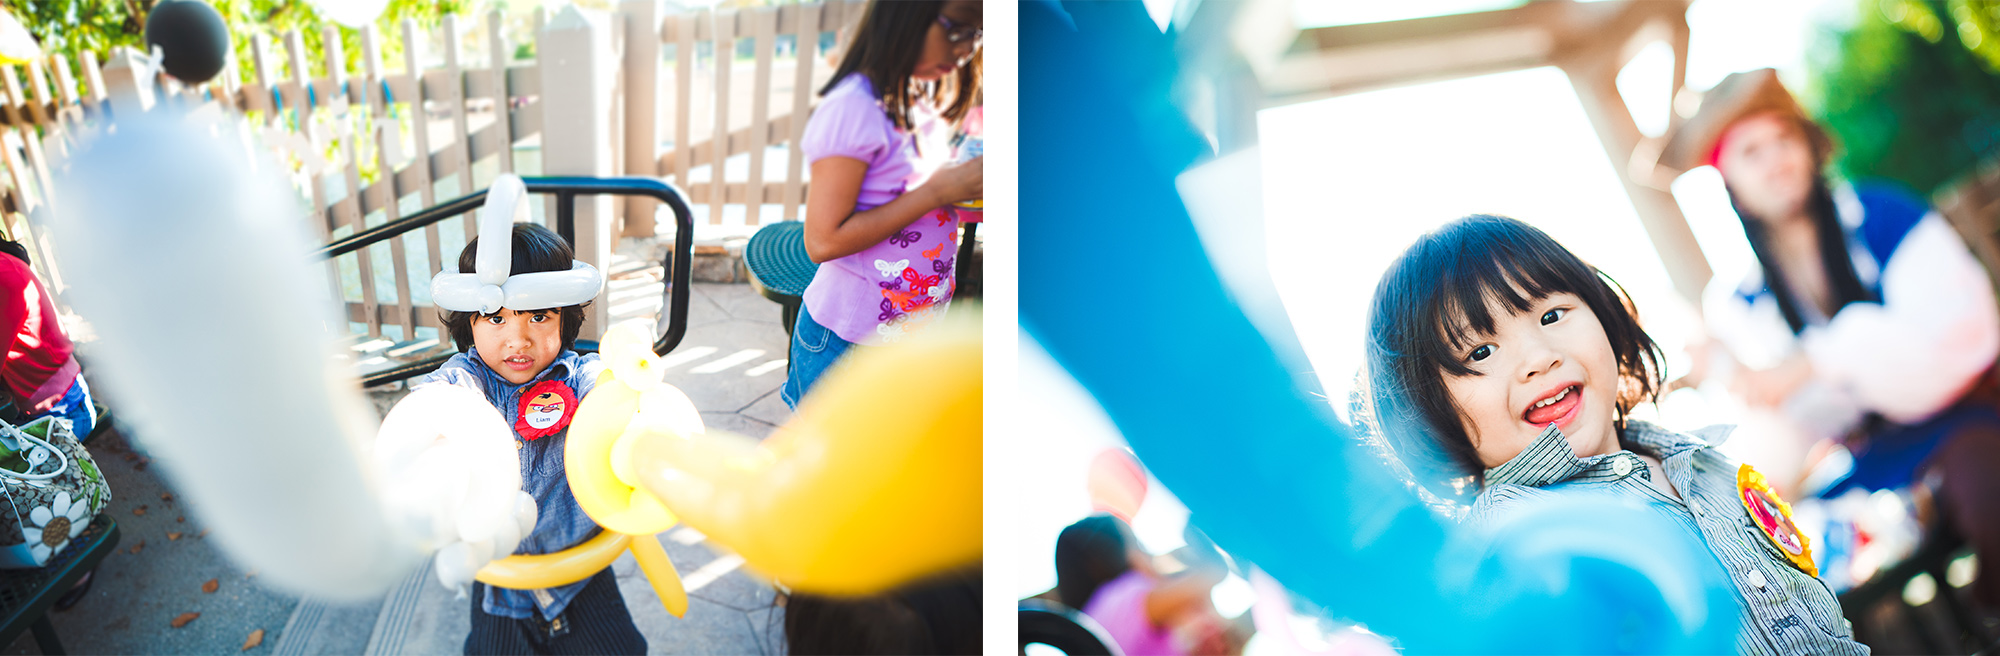 newburyport-birthday-party-photographer-stephen-grant-photography-060.jpg